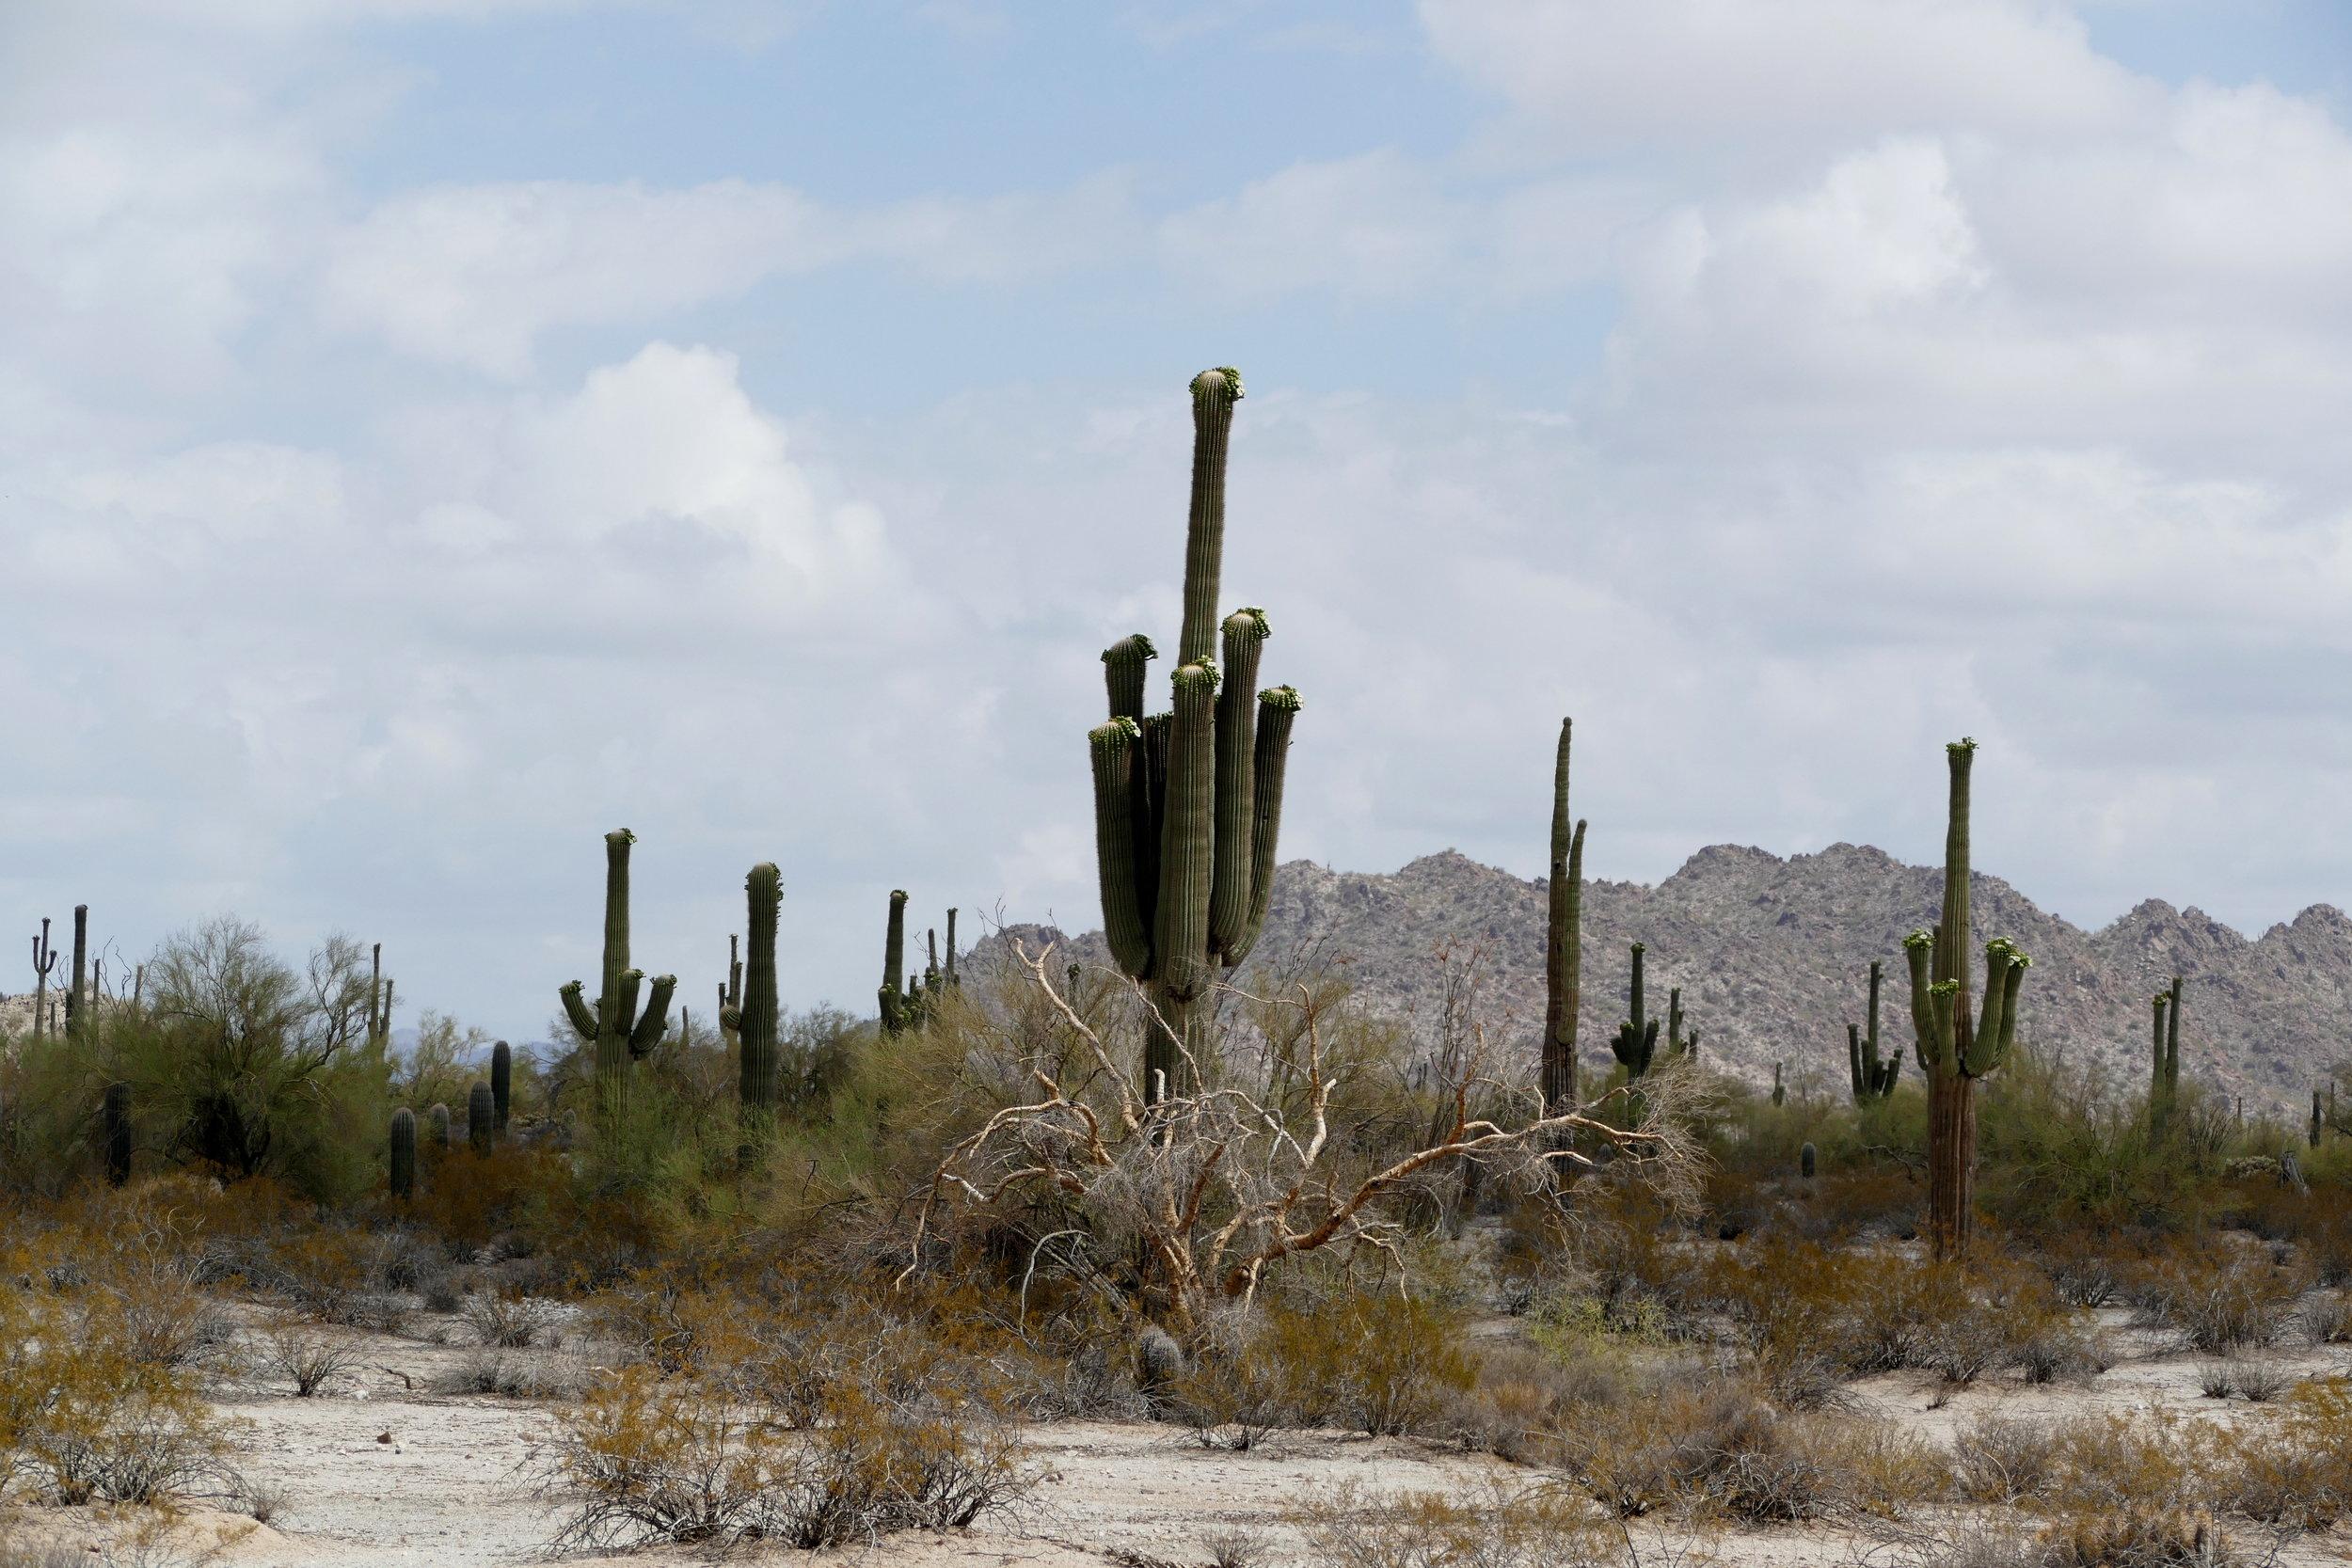 Mountainous desert terrain